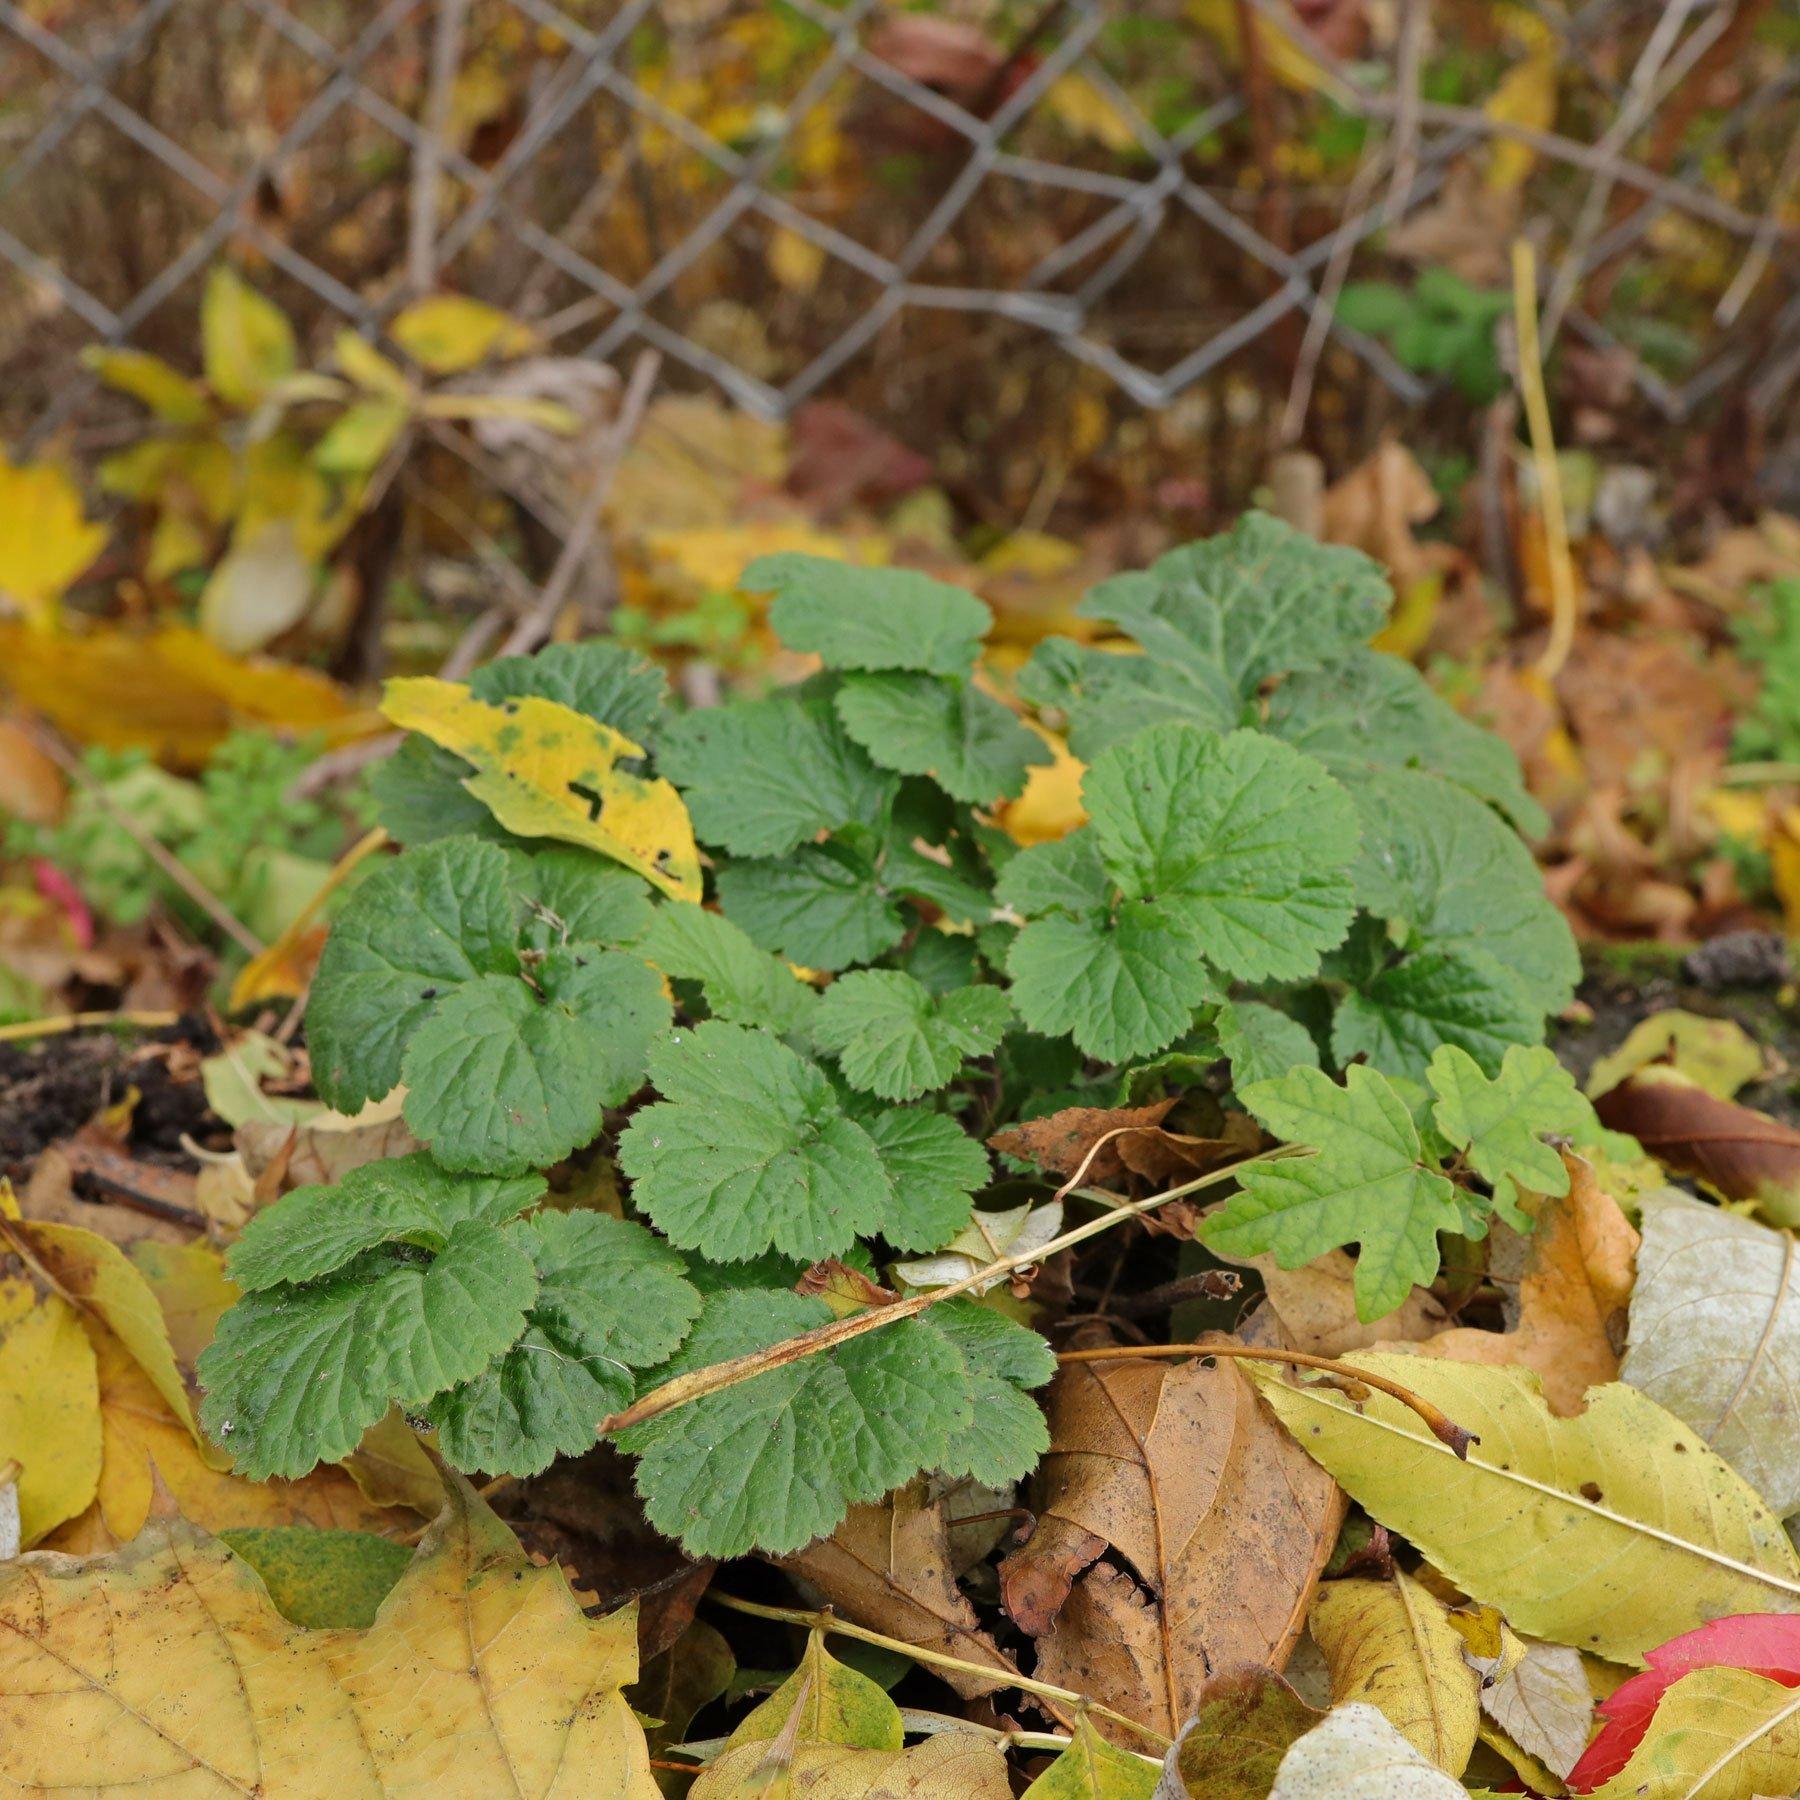 Nelkenwurz Blätter